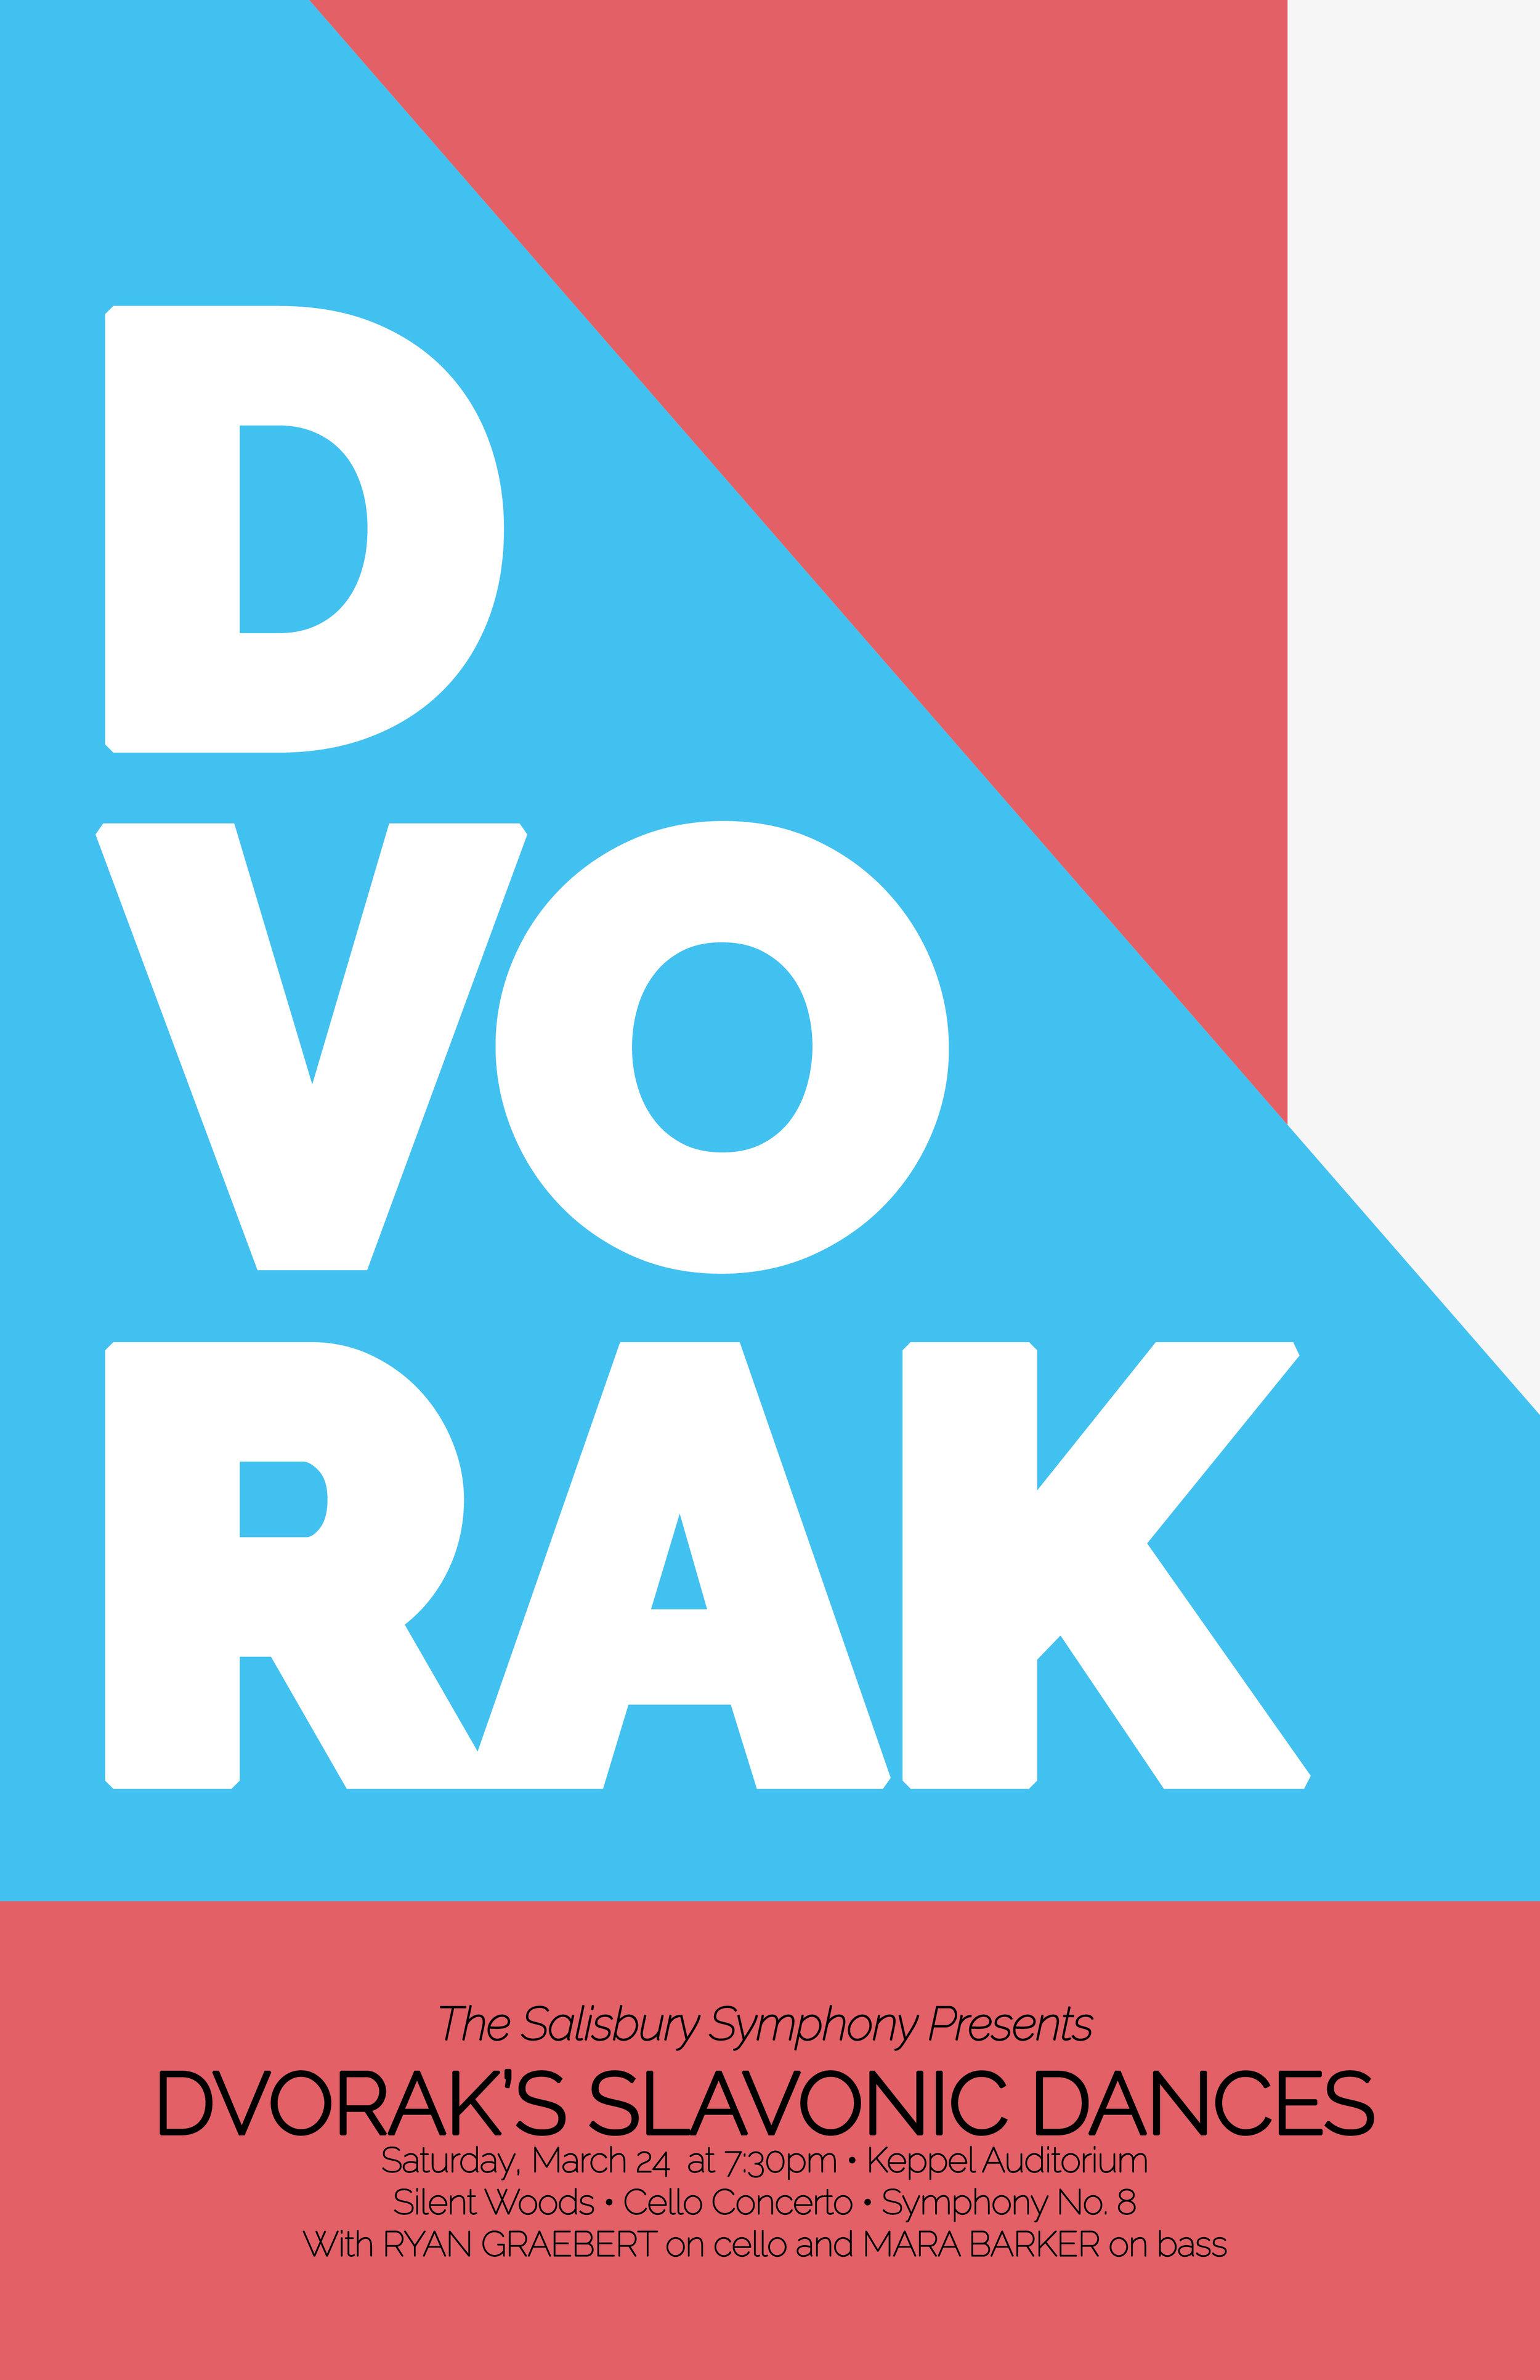 Dvorak's Slavonic Dances Poster